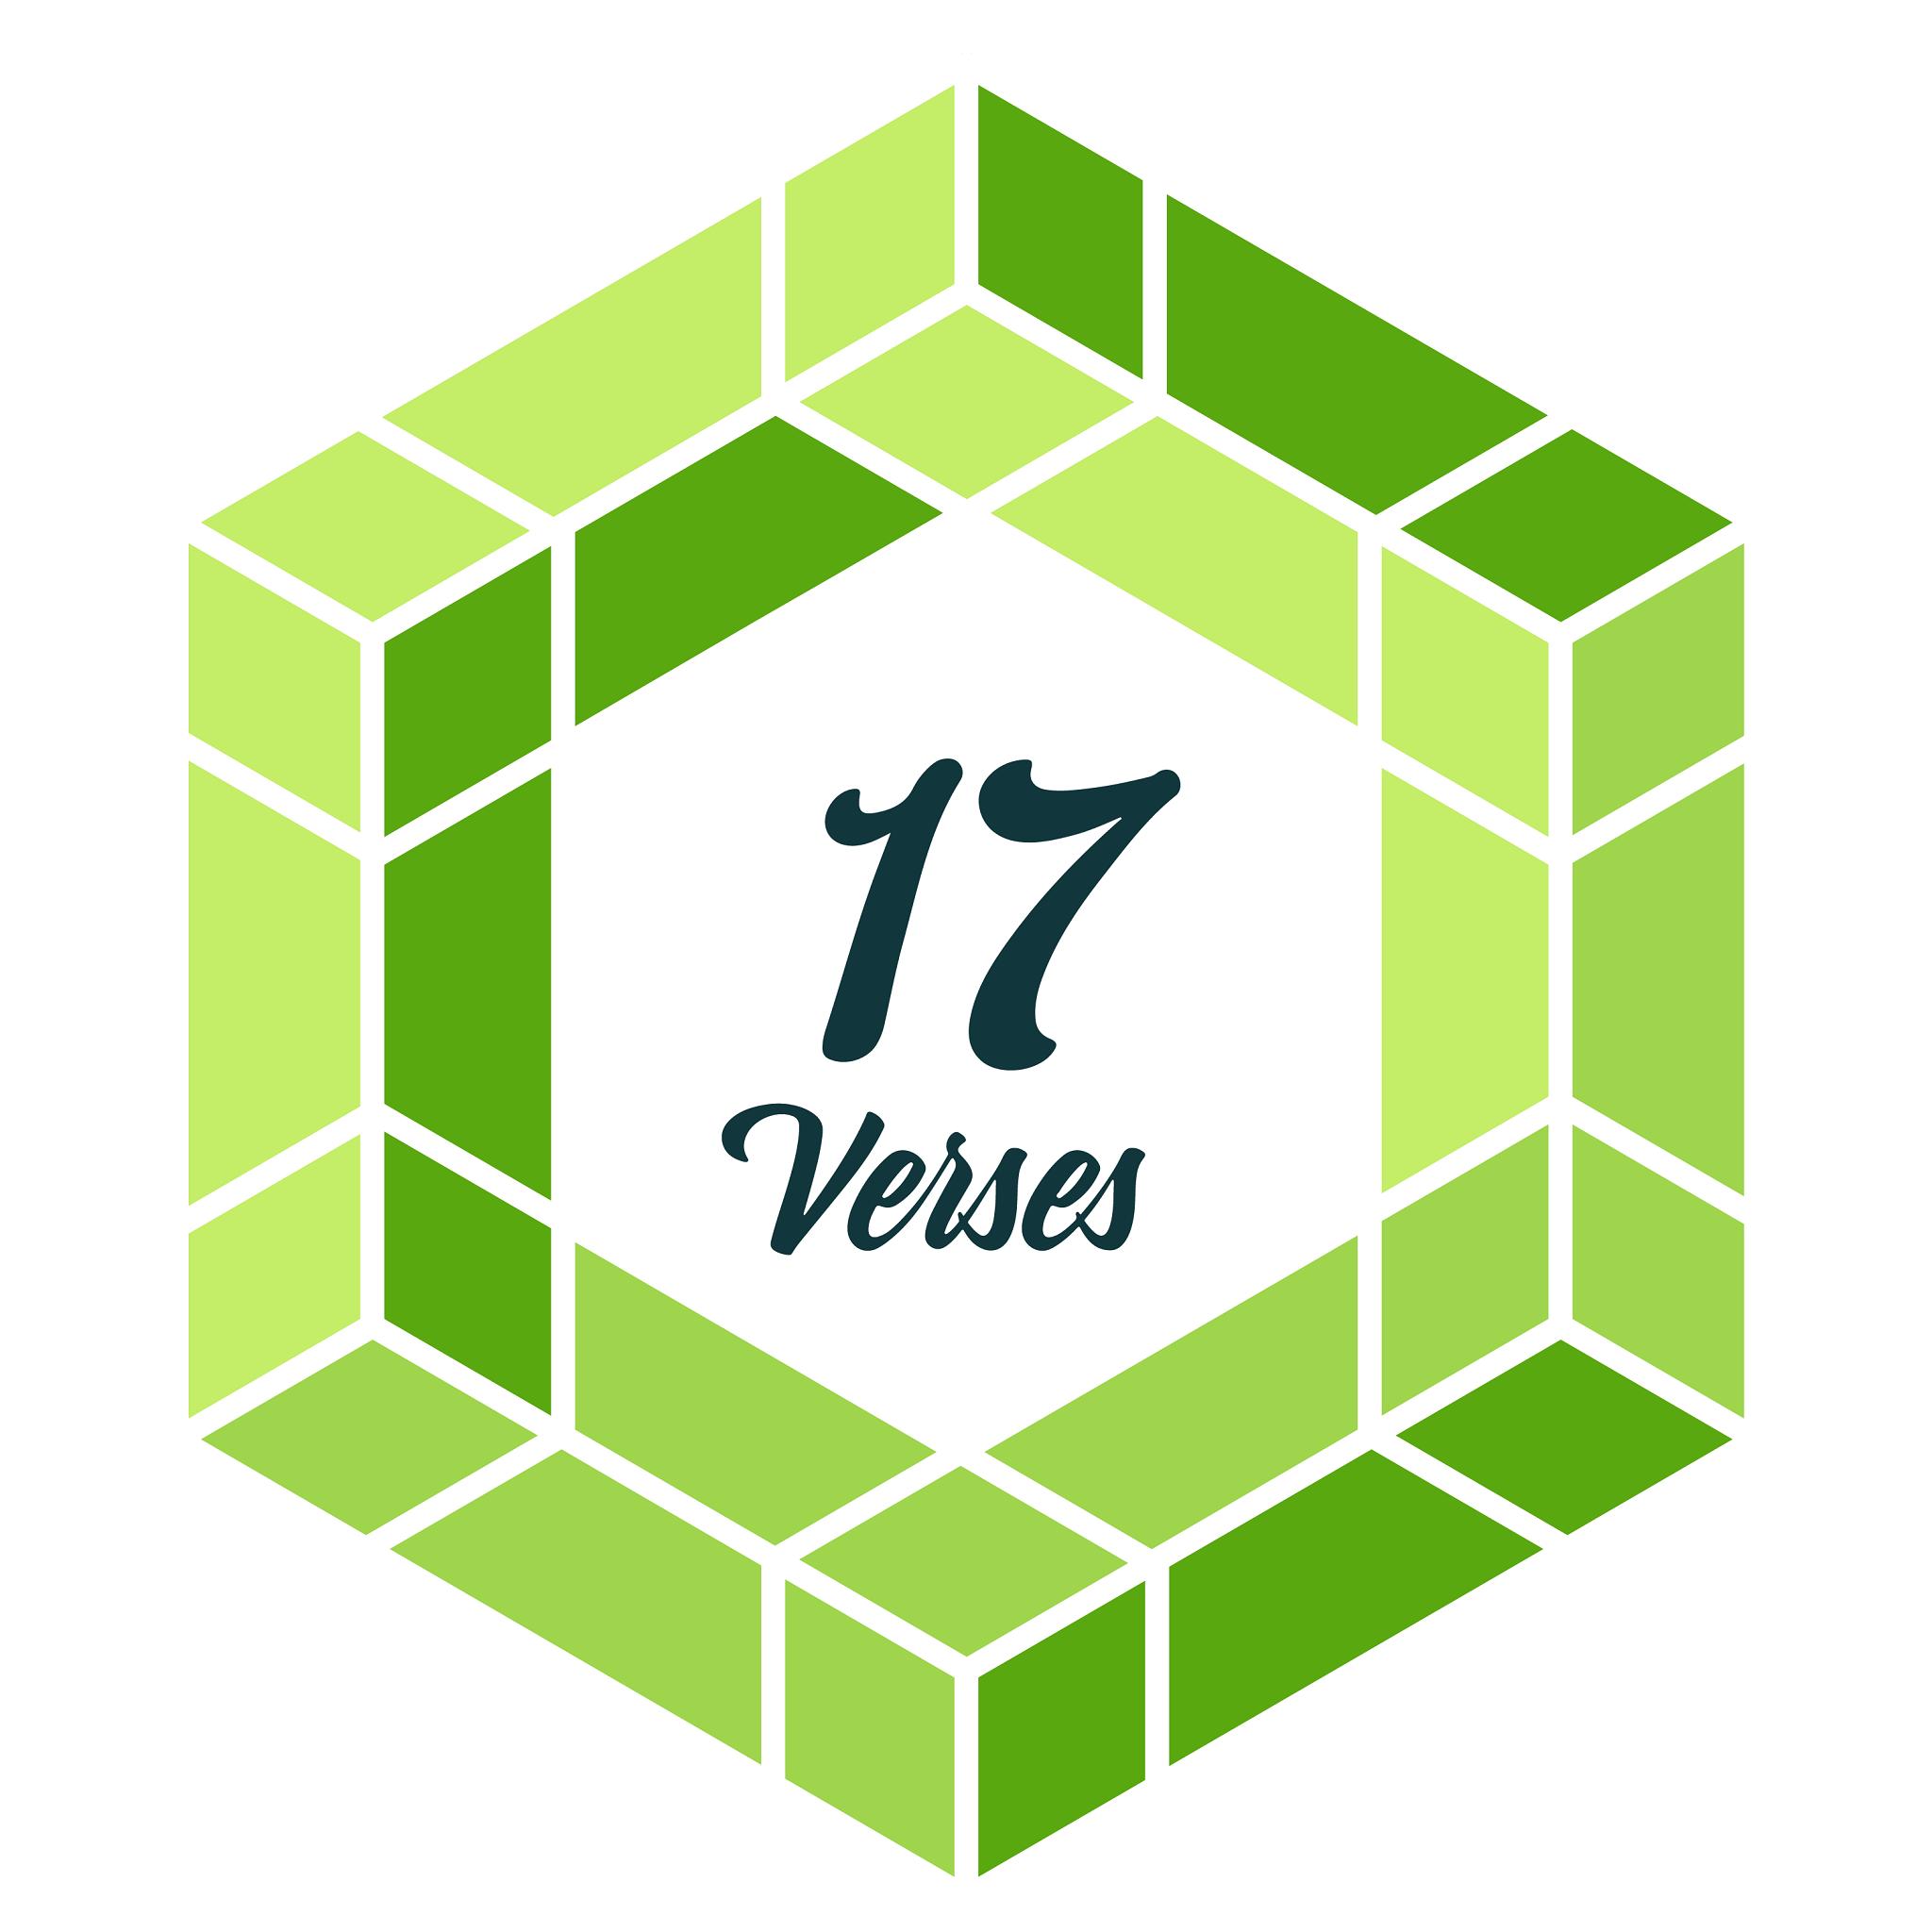 Year 2 - Surah 4 (An-Nisâ), Verses 60-70